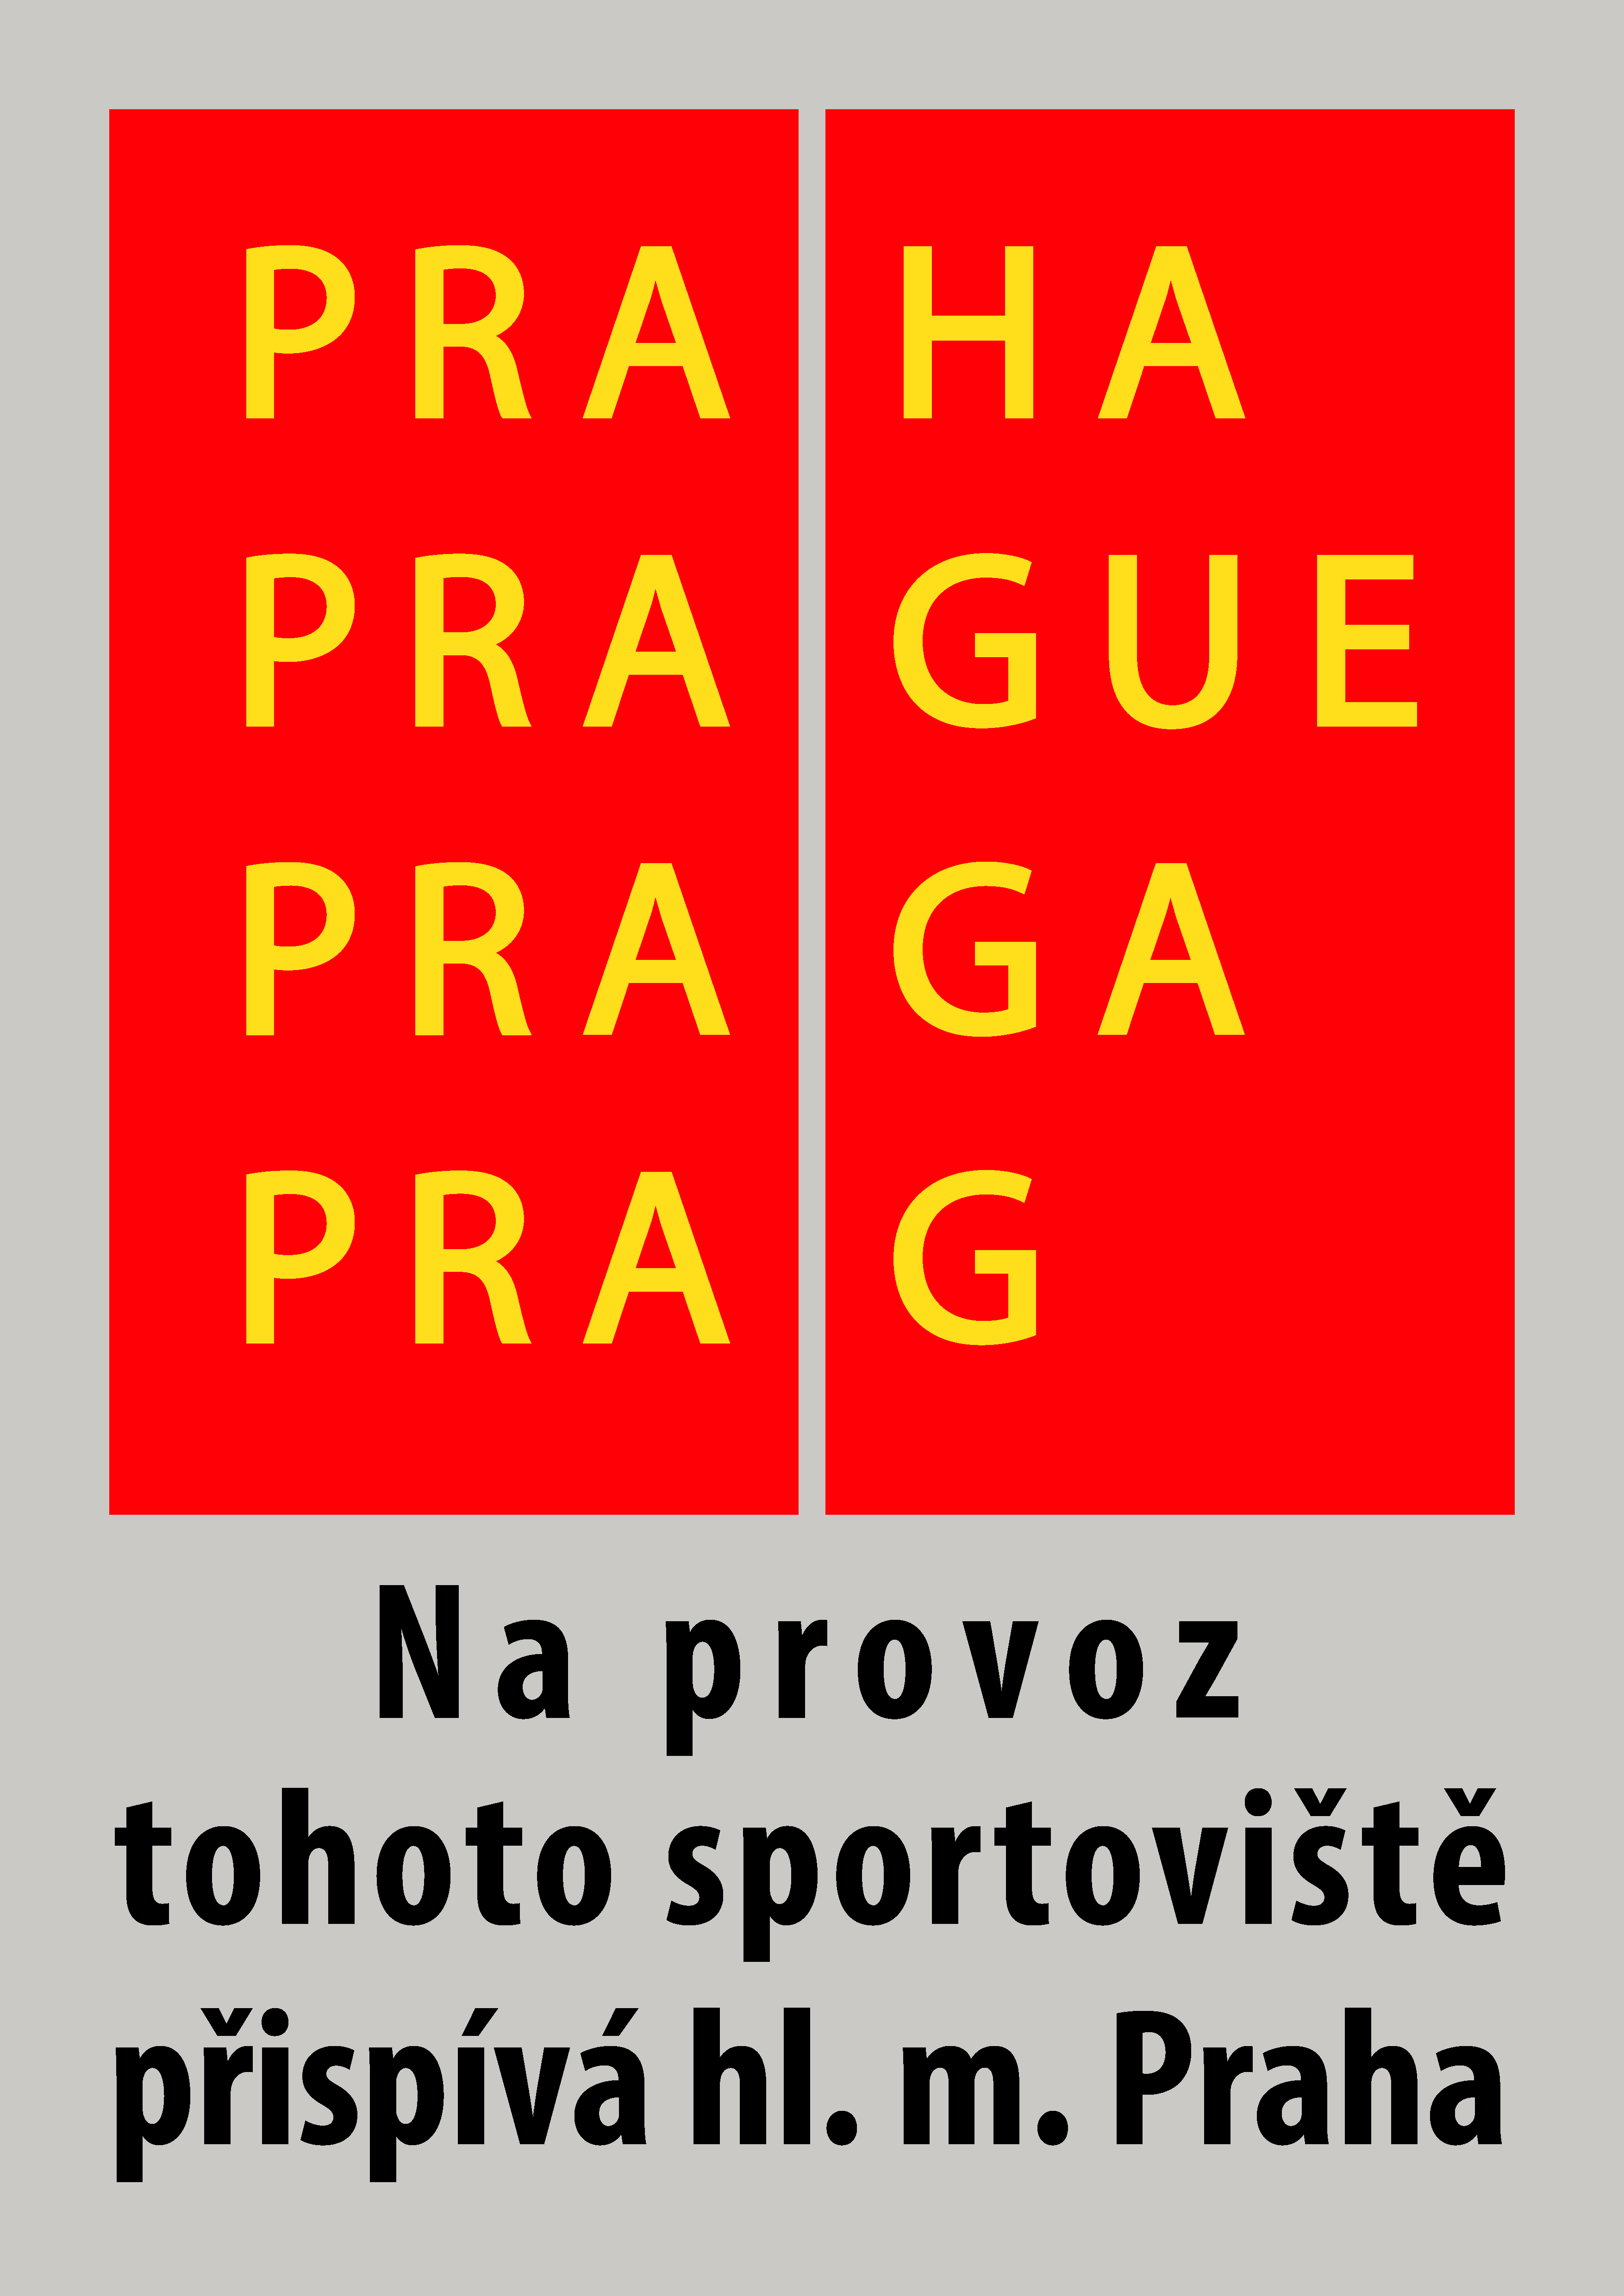 Na provoz tohoto sportoviste prispiva hl. m. Praha